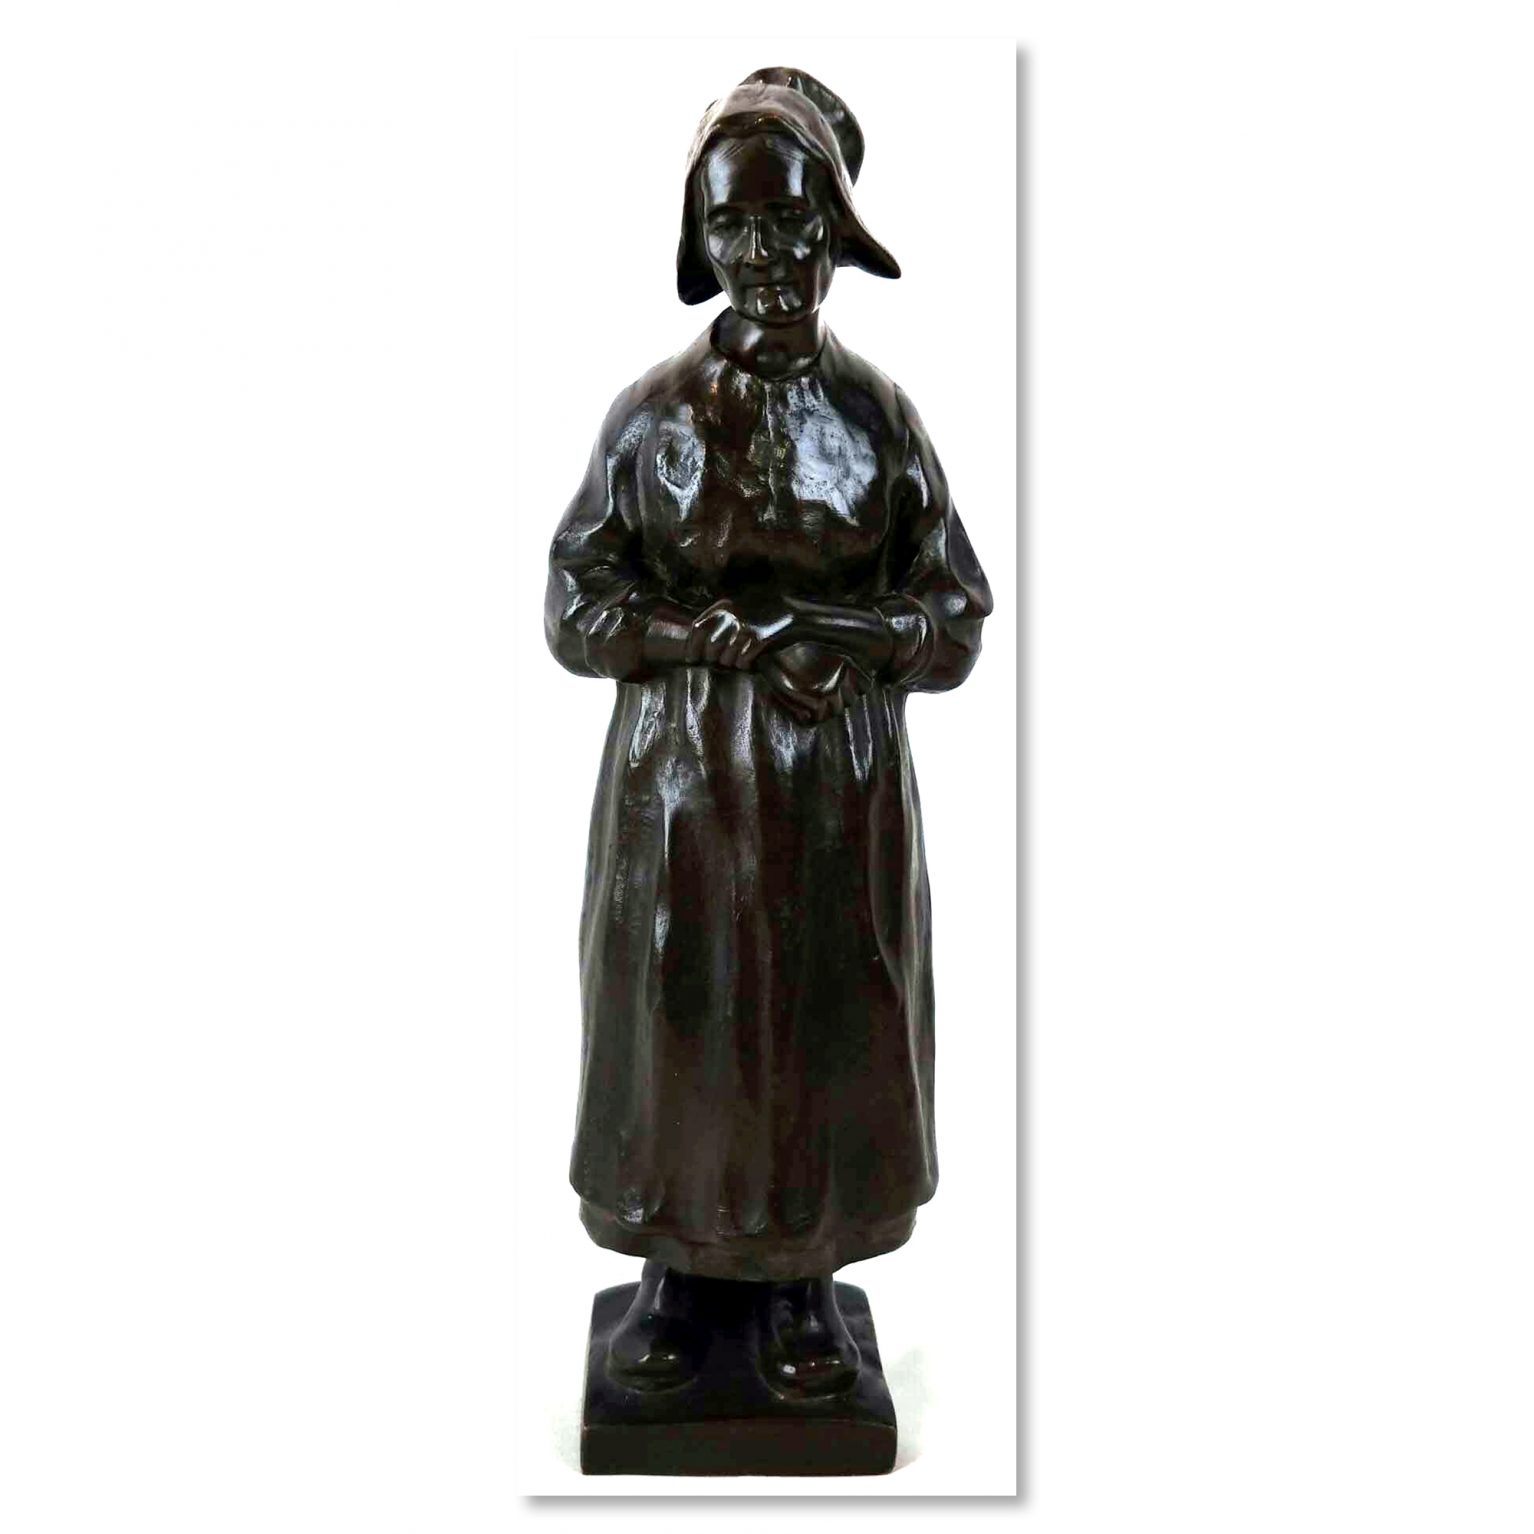 Godefroid Devreese (1861-1941)